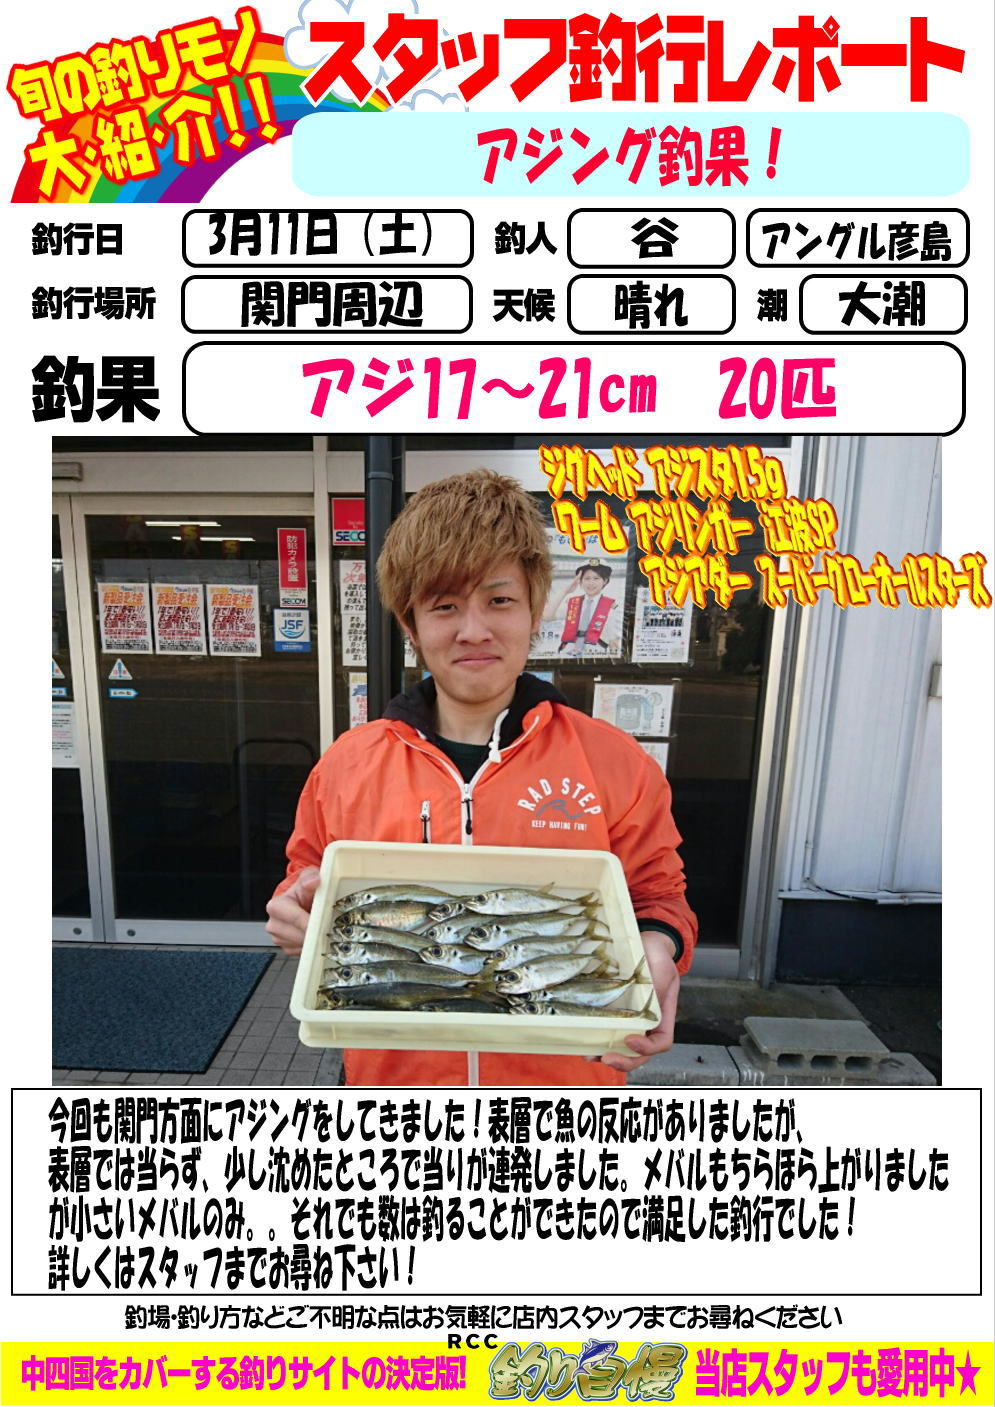 http://www.e-angle.co.jp/shop/blog/blog-20170311-hikoshima-aji.jpg